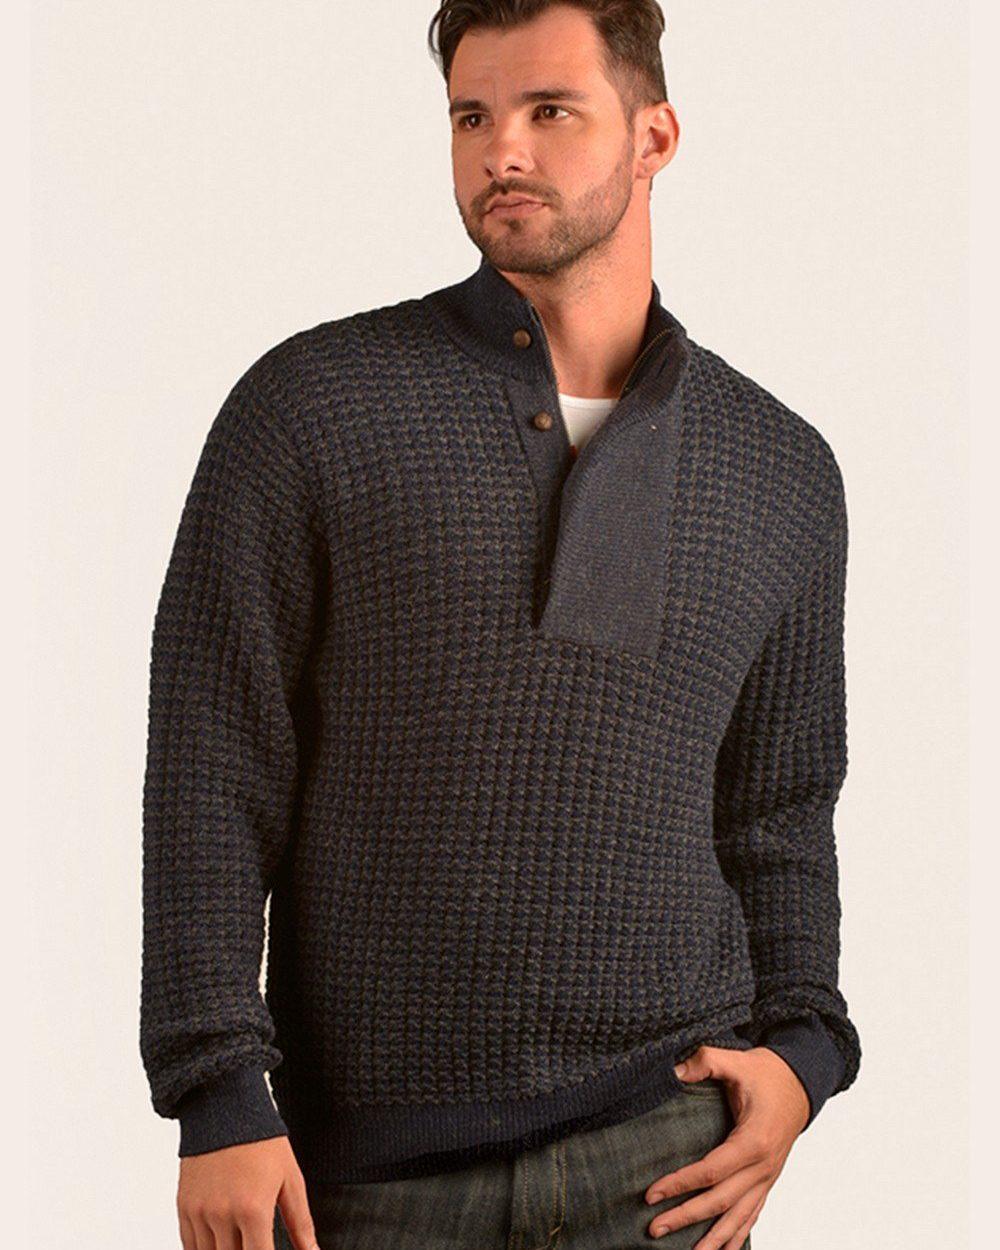 Pull à col montant tricot gaufré en baby alpaga